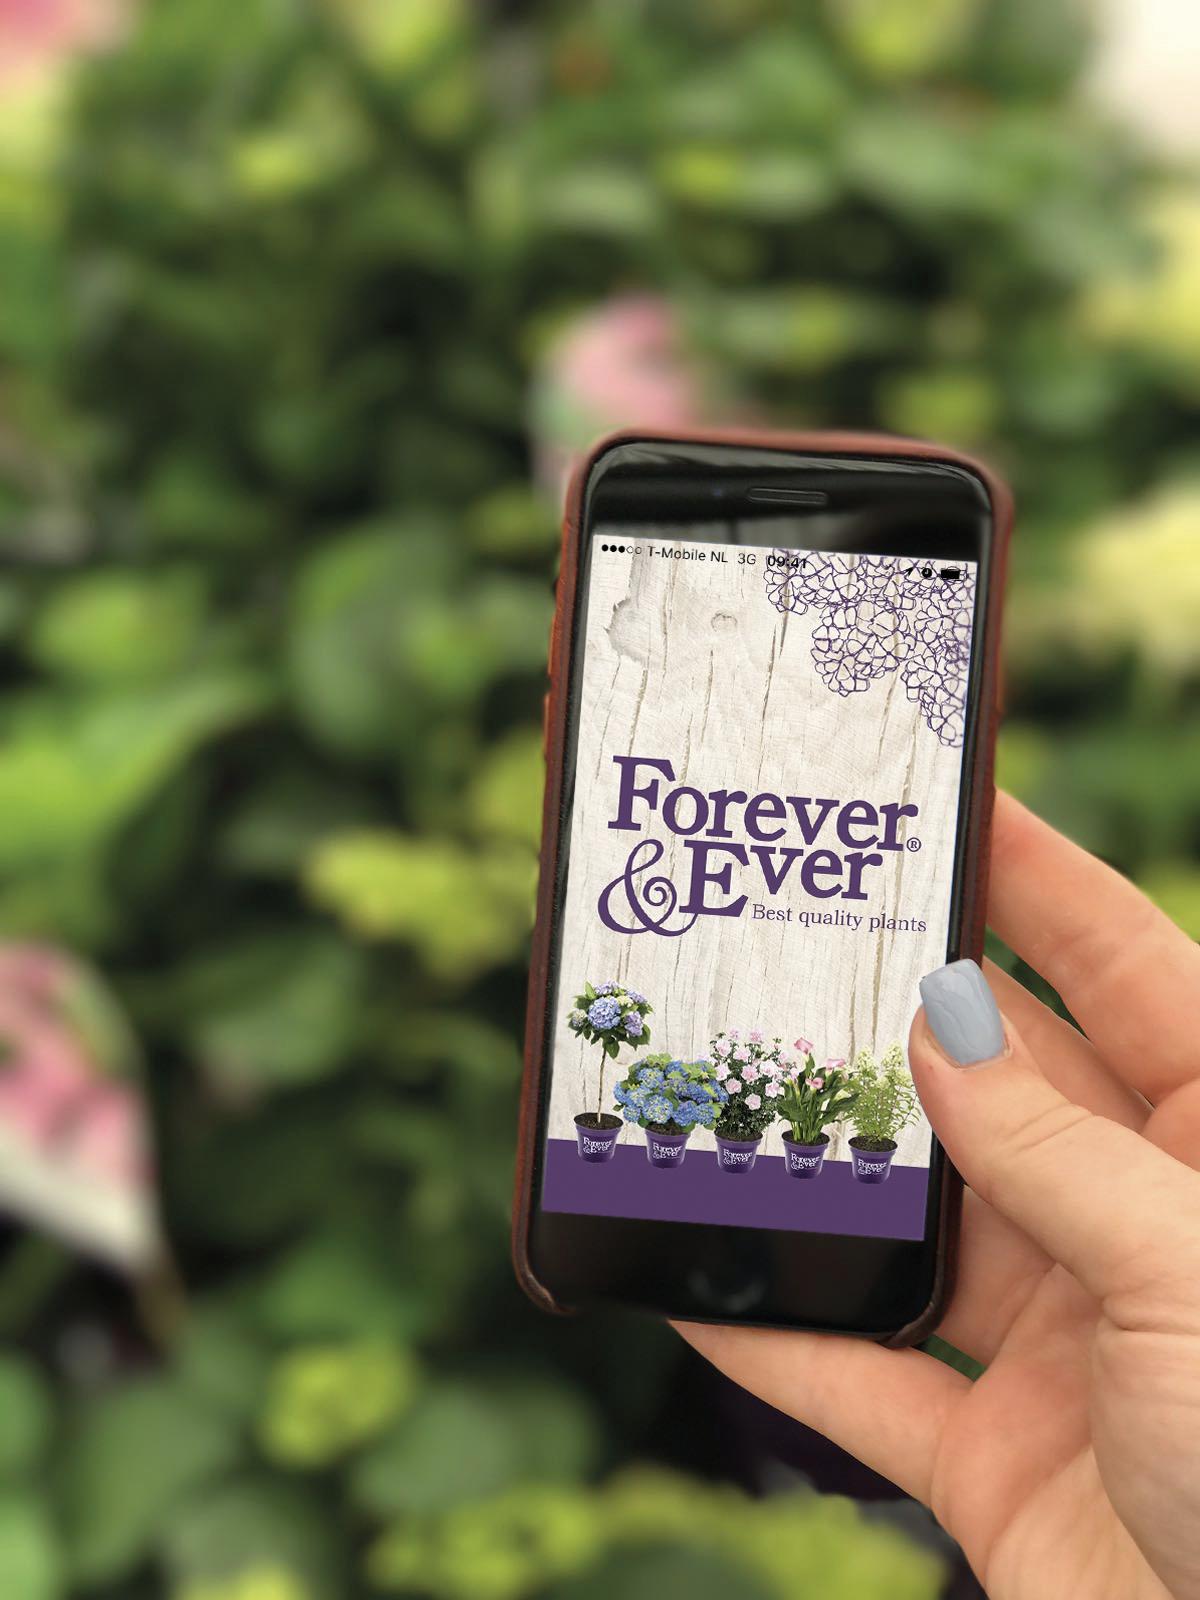 Forever&Ever onderhouds- en verzorgingsapp